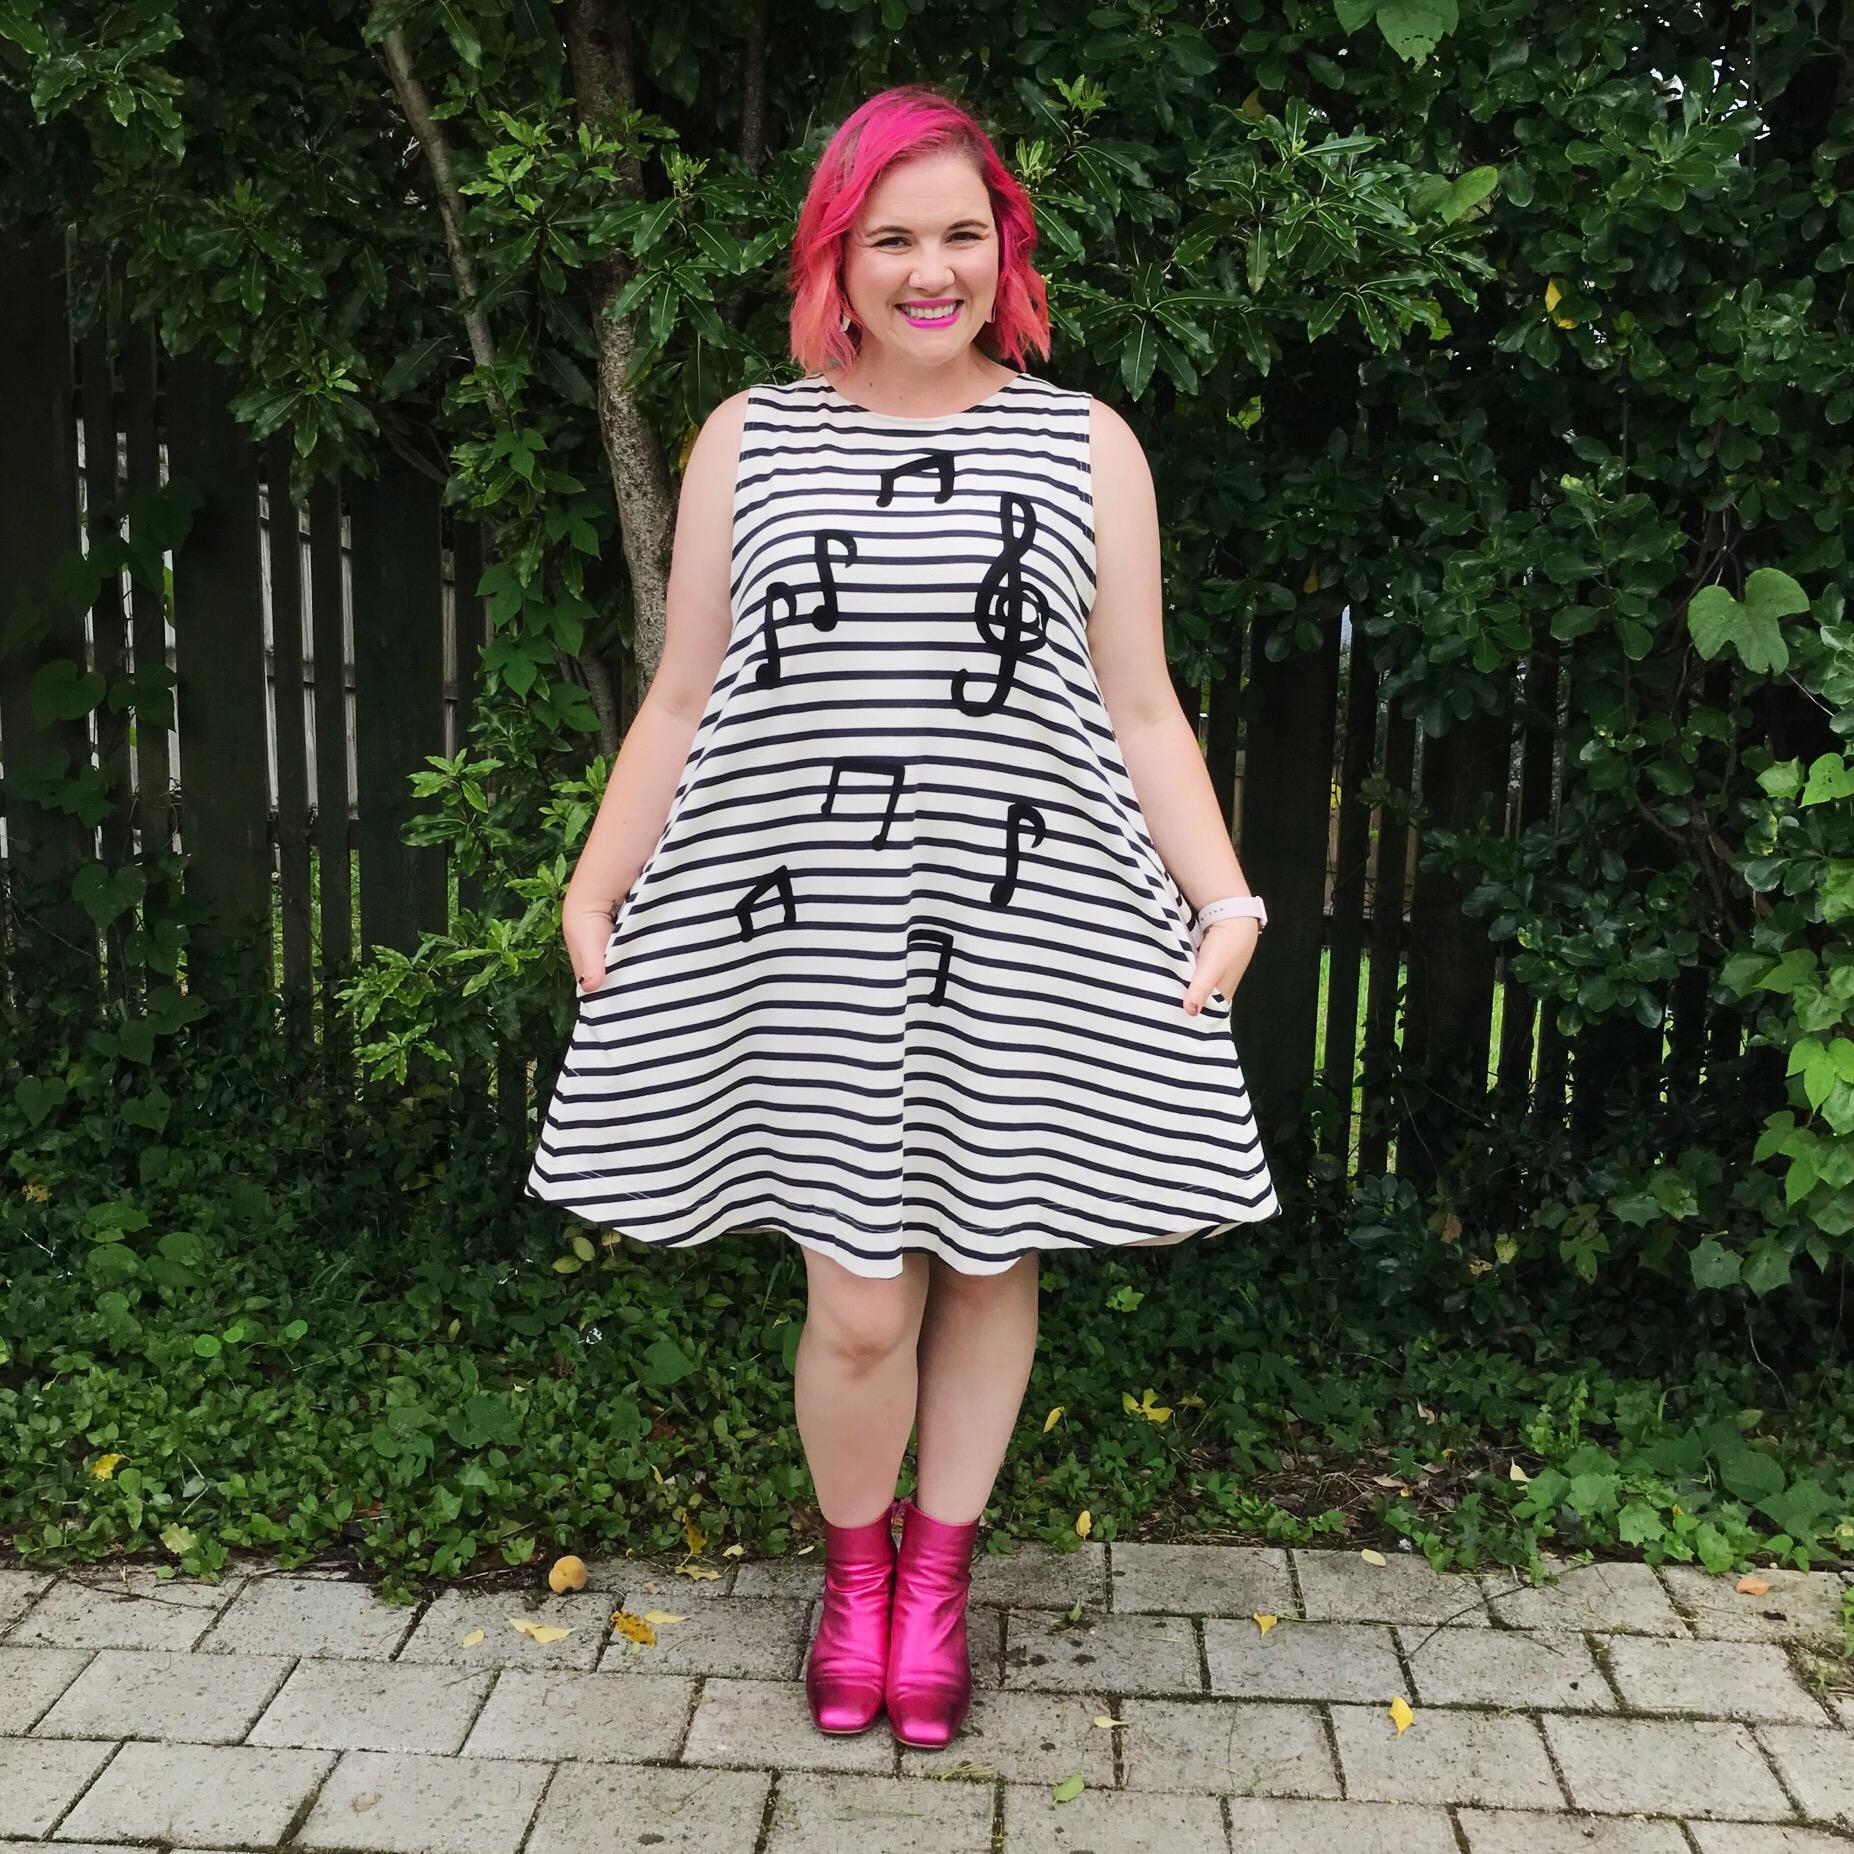 Dress by Gorman, boots by Mi Piaci.